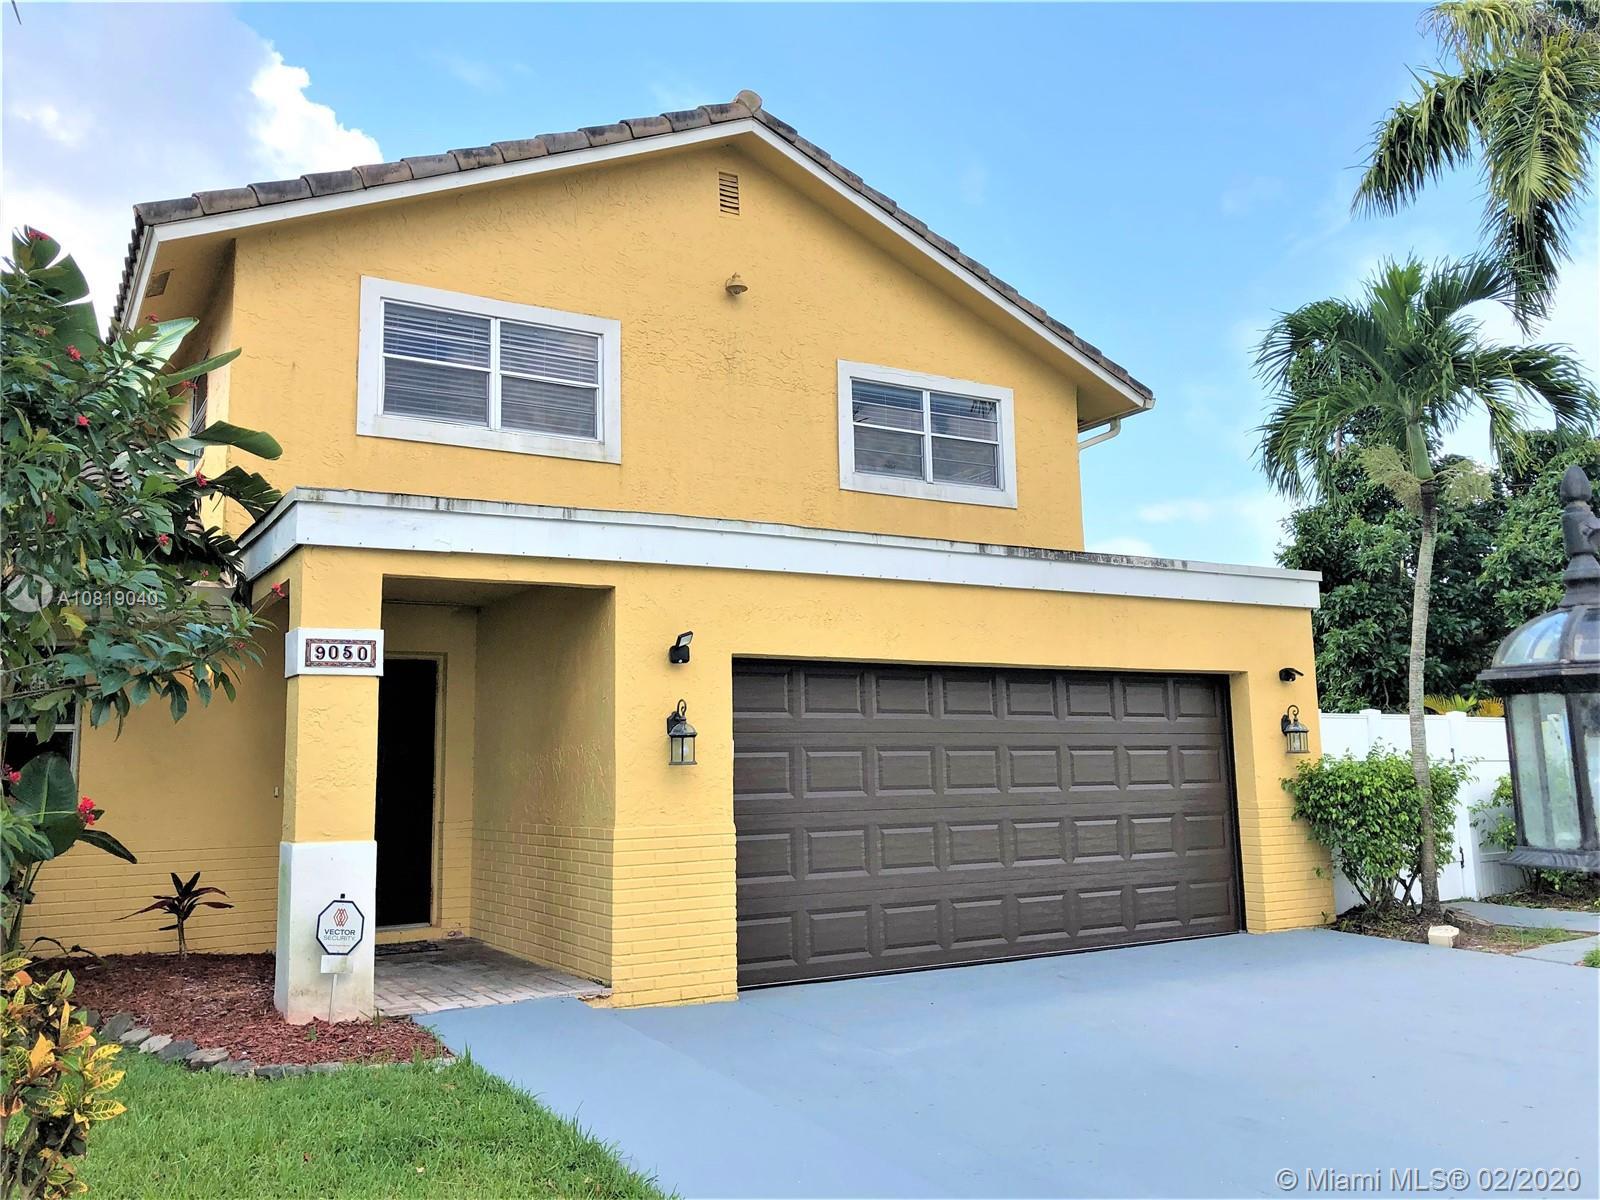 9050 SW 8th St, Boca Raton, FL 33433